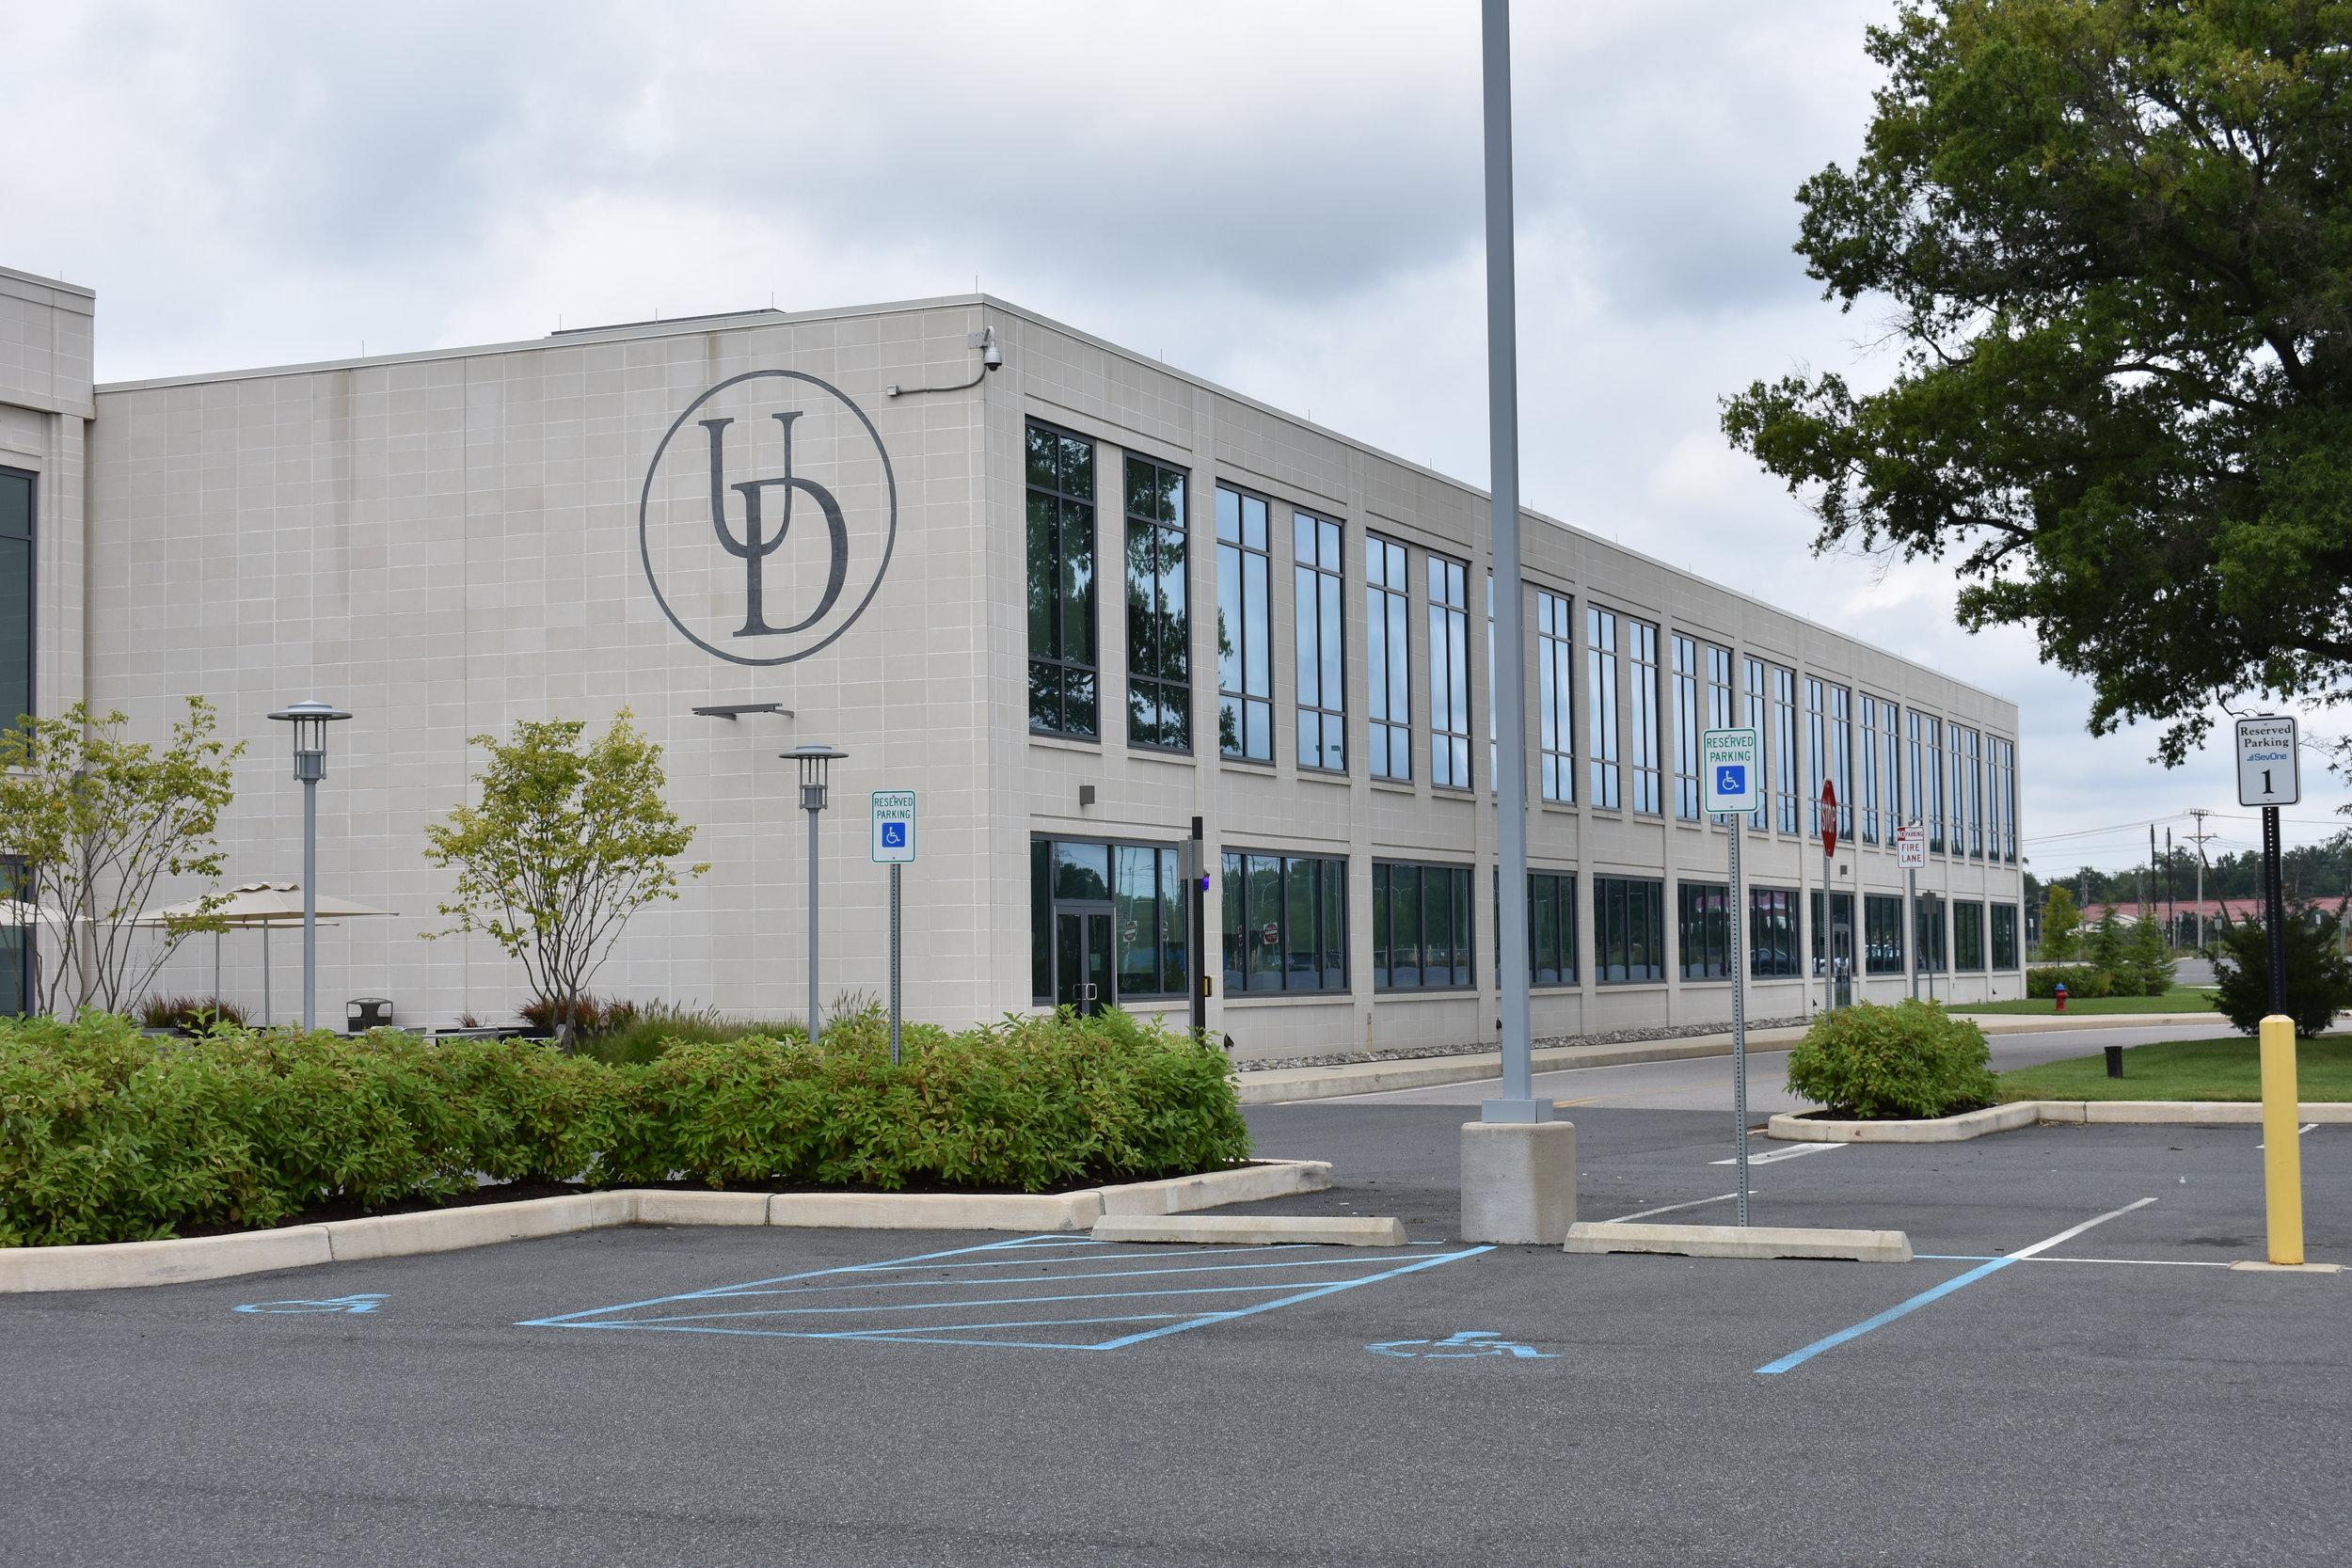 University of Delaware STAR Campus